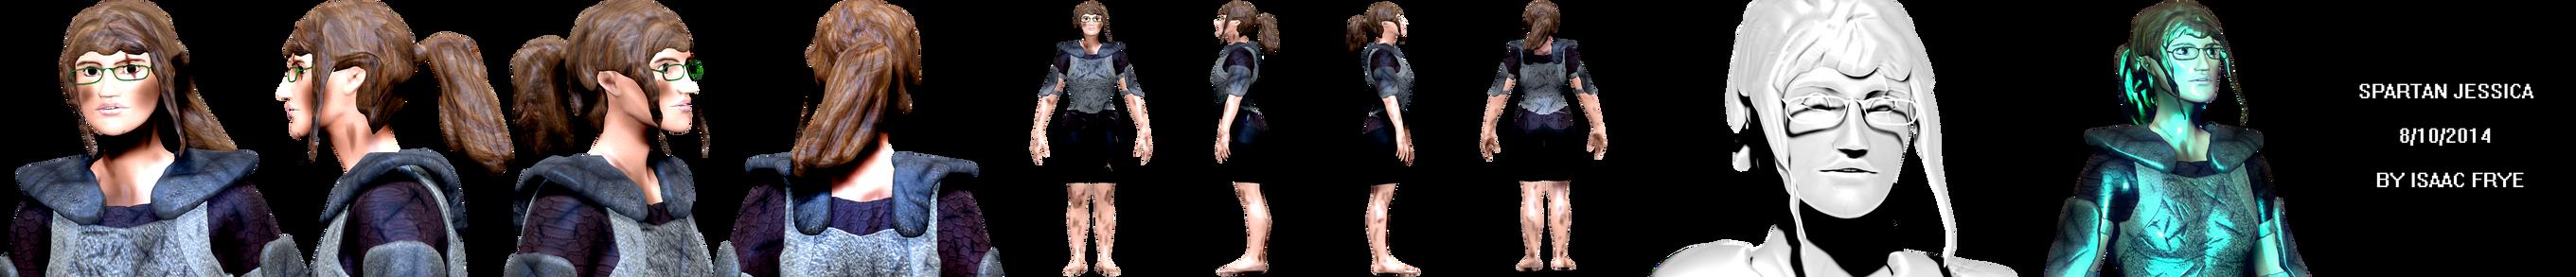 Jessica Spartan - Female Warrior 3D Model Render by HomelessGoomba